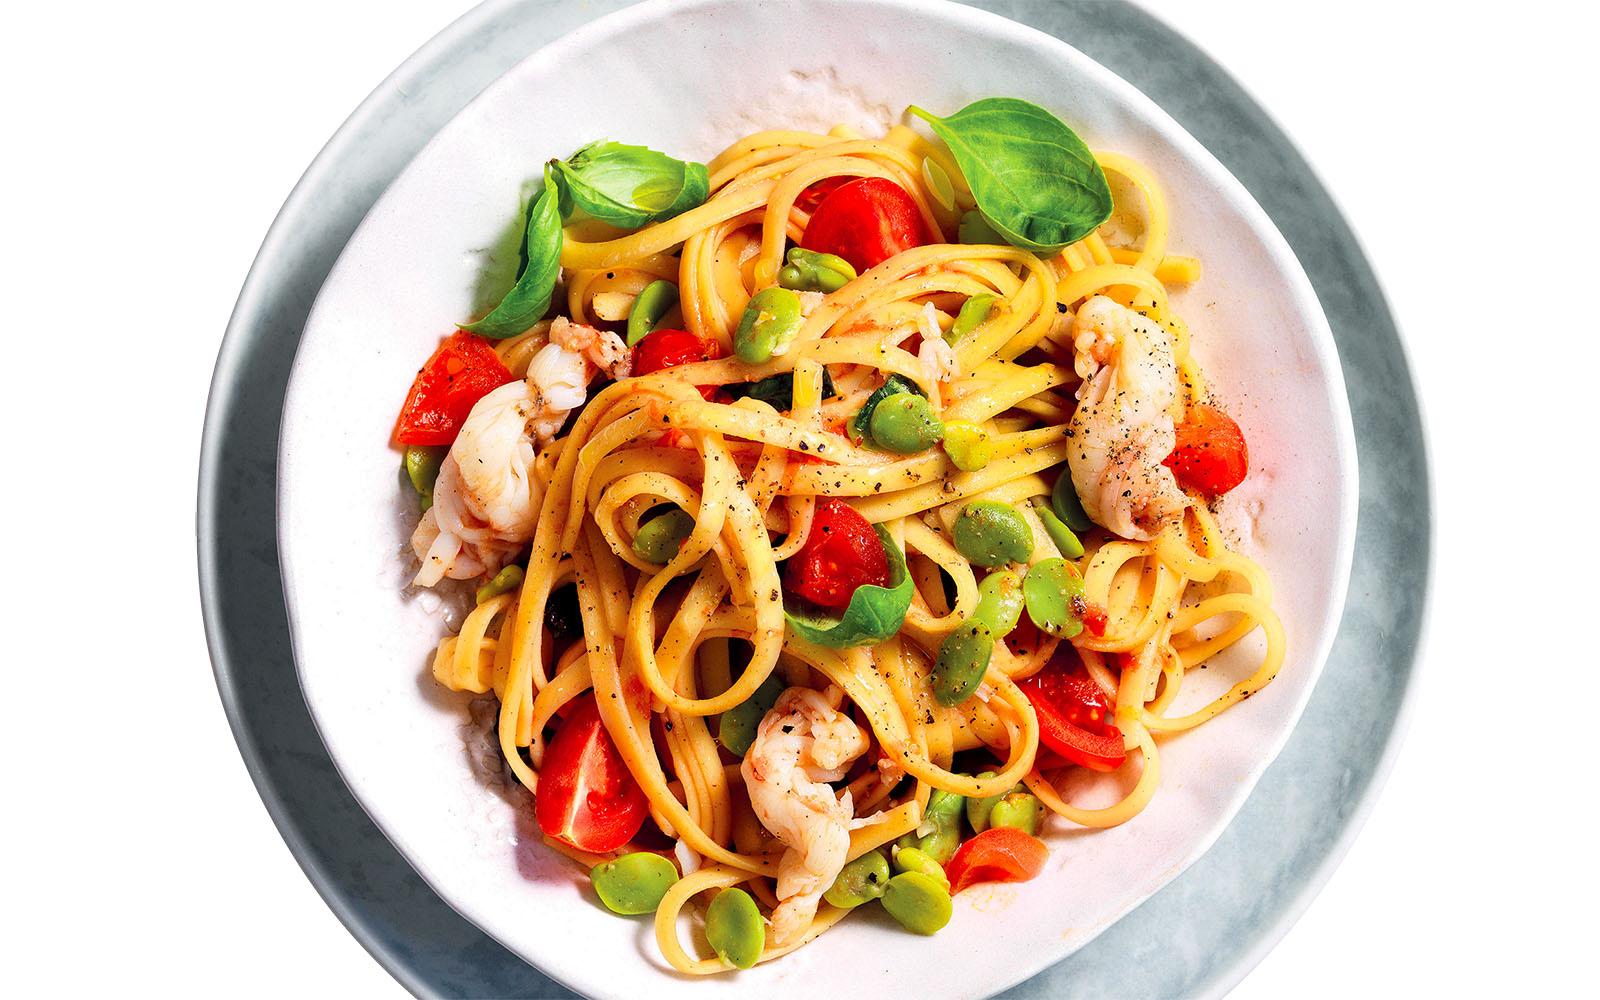 Italian Recipes The Art Of Eating Italian - cover